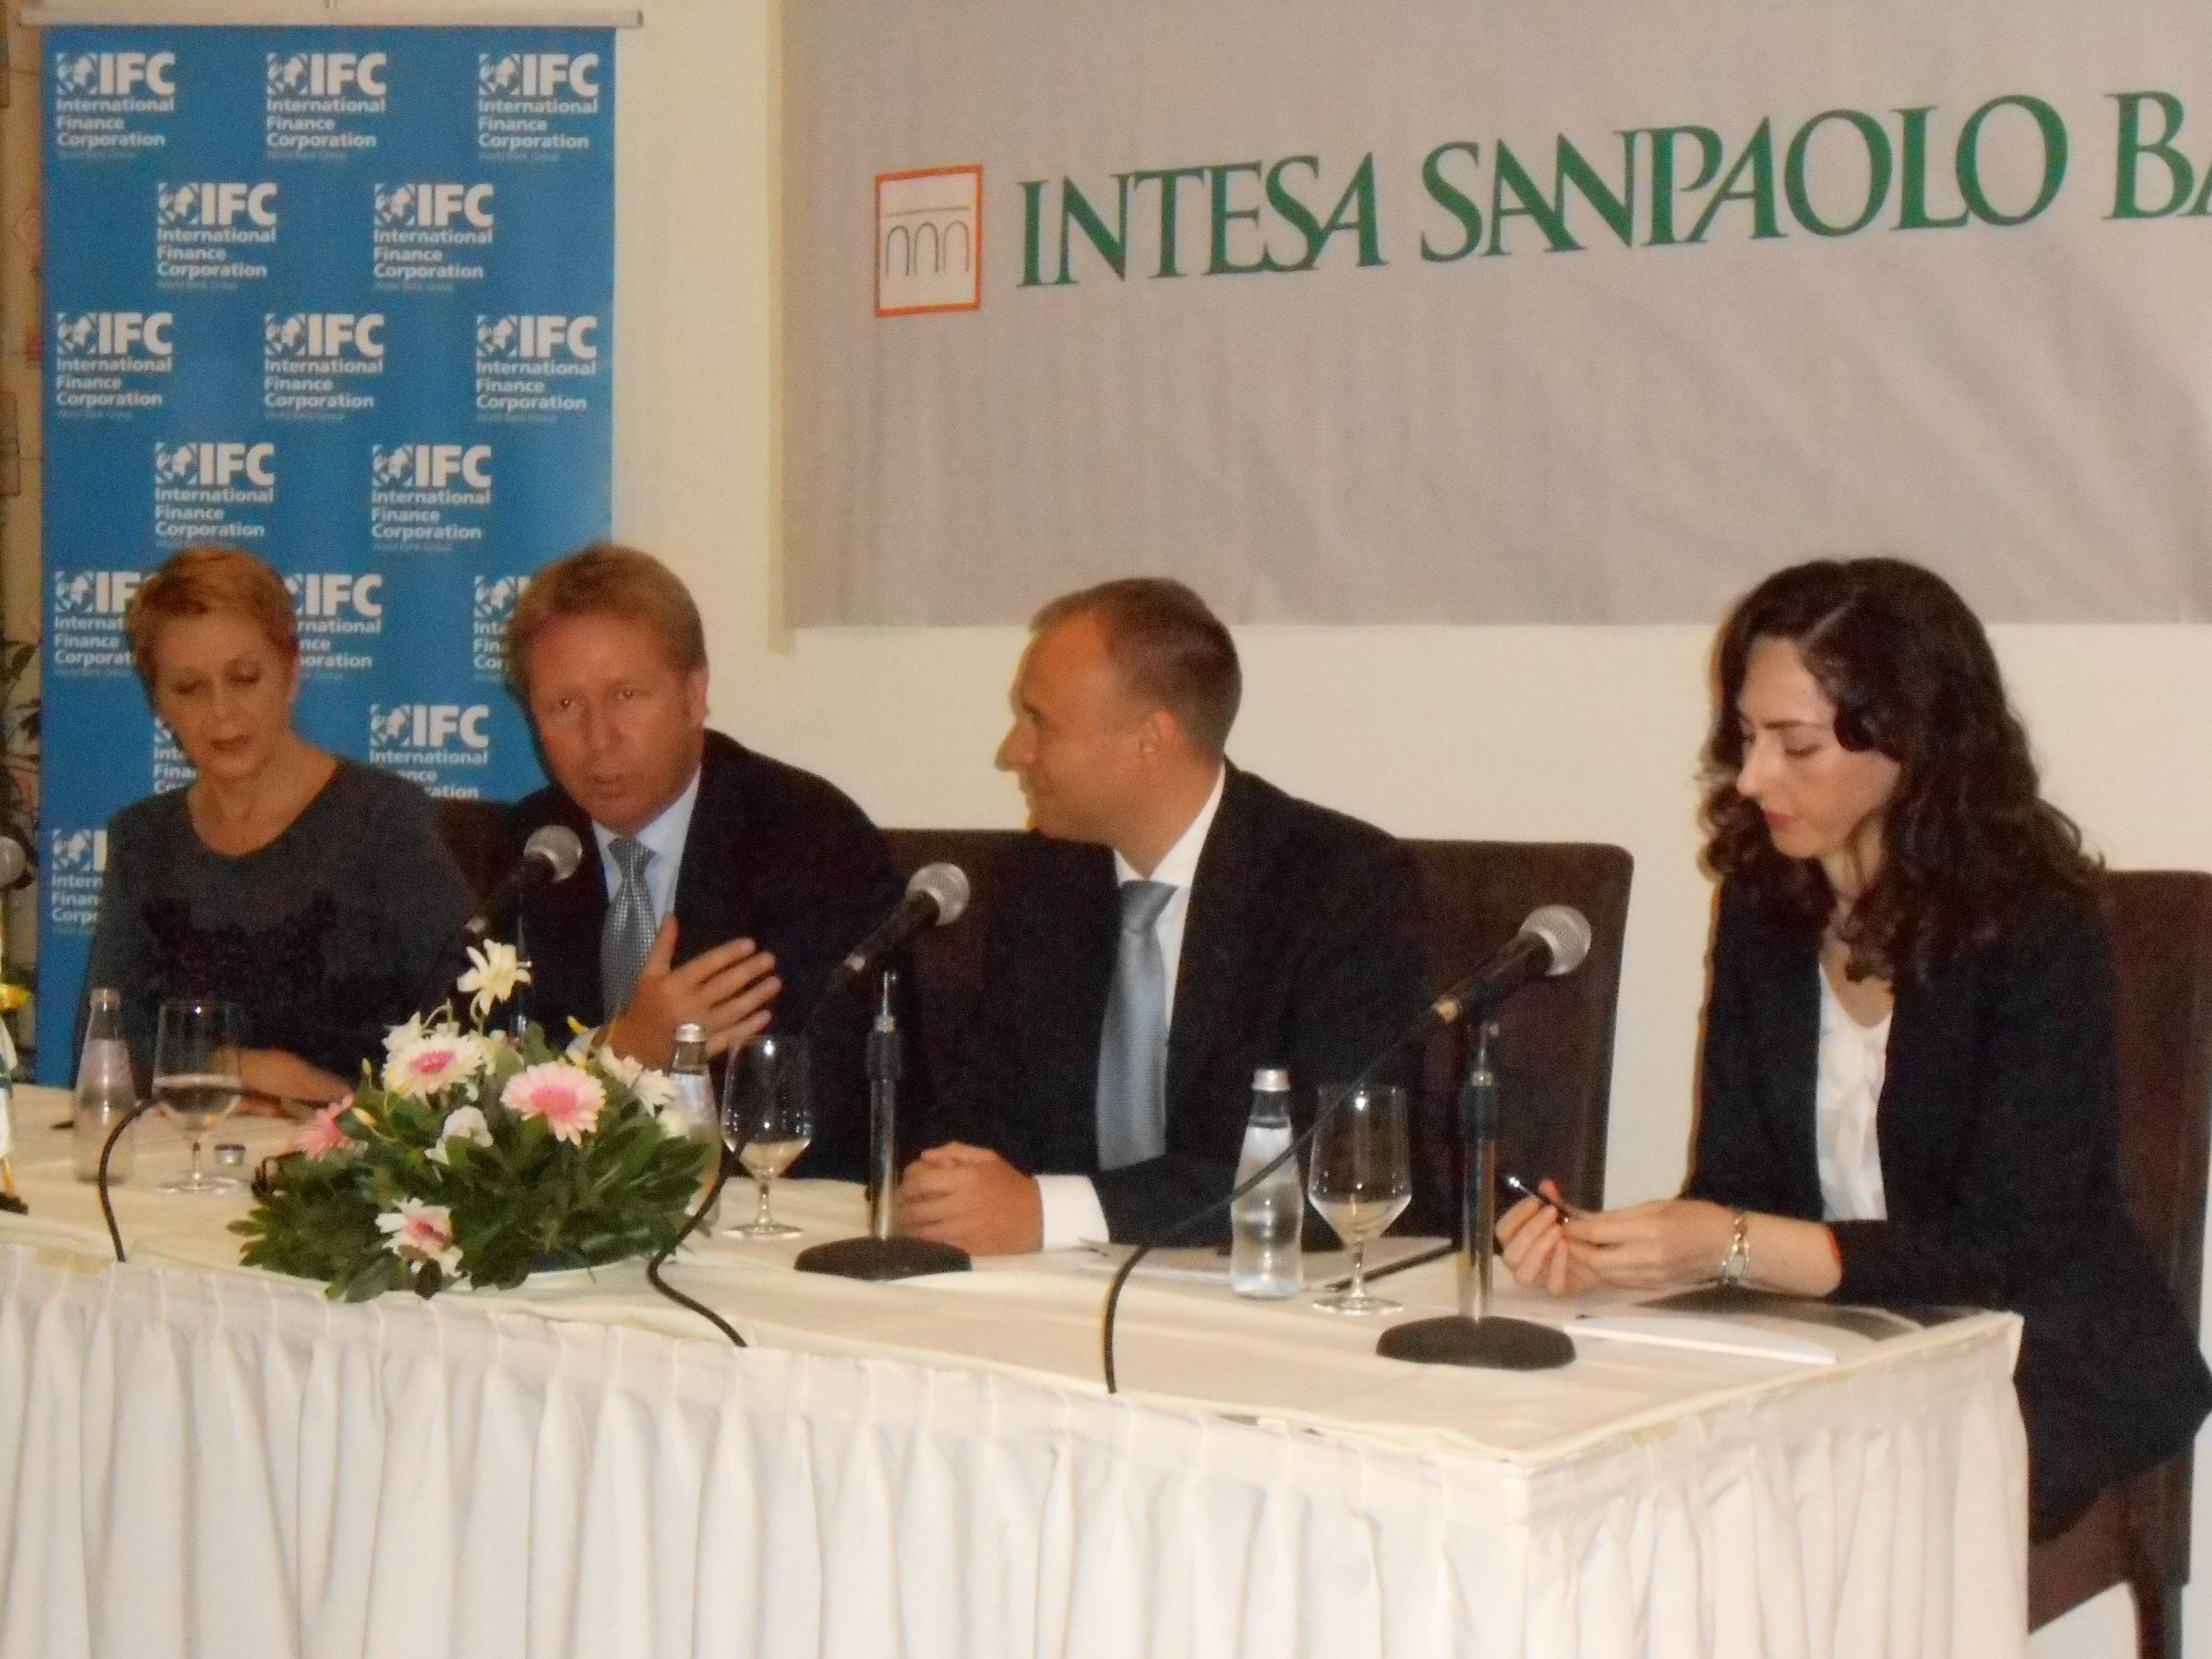 IFC Intesa Sanpaolo